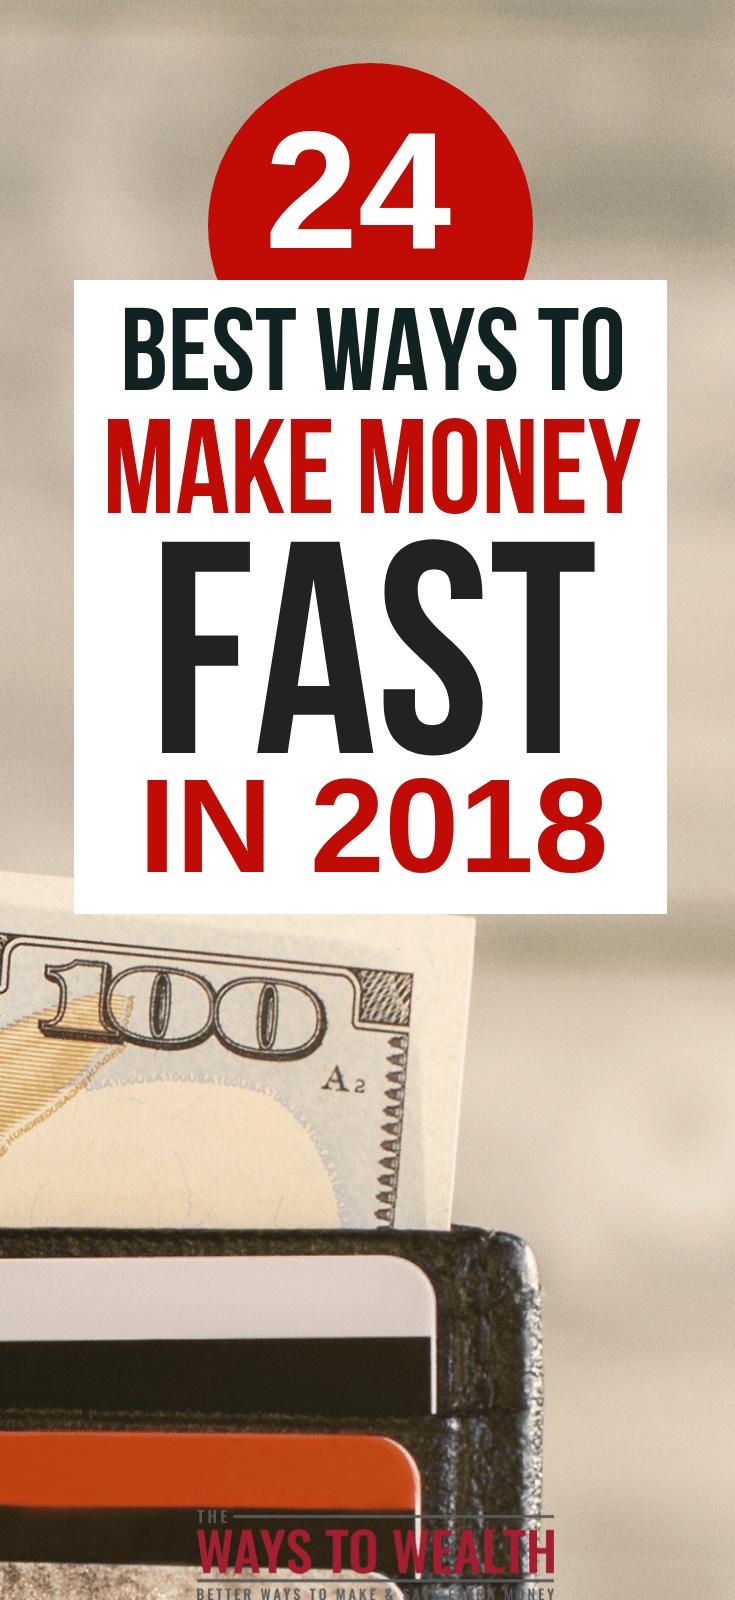 24+ Safe, Creative, & Fast Ways To Get Money FastNeed money fast? Here's more than 20 safe and creative ways to get money in a hurry.#thewaystowealth #makemoneyfast #makemoney #makemoneyonline